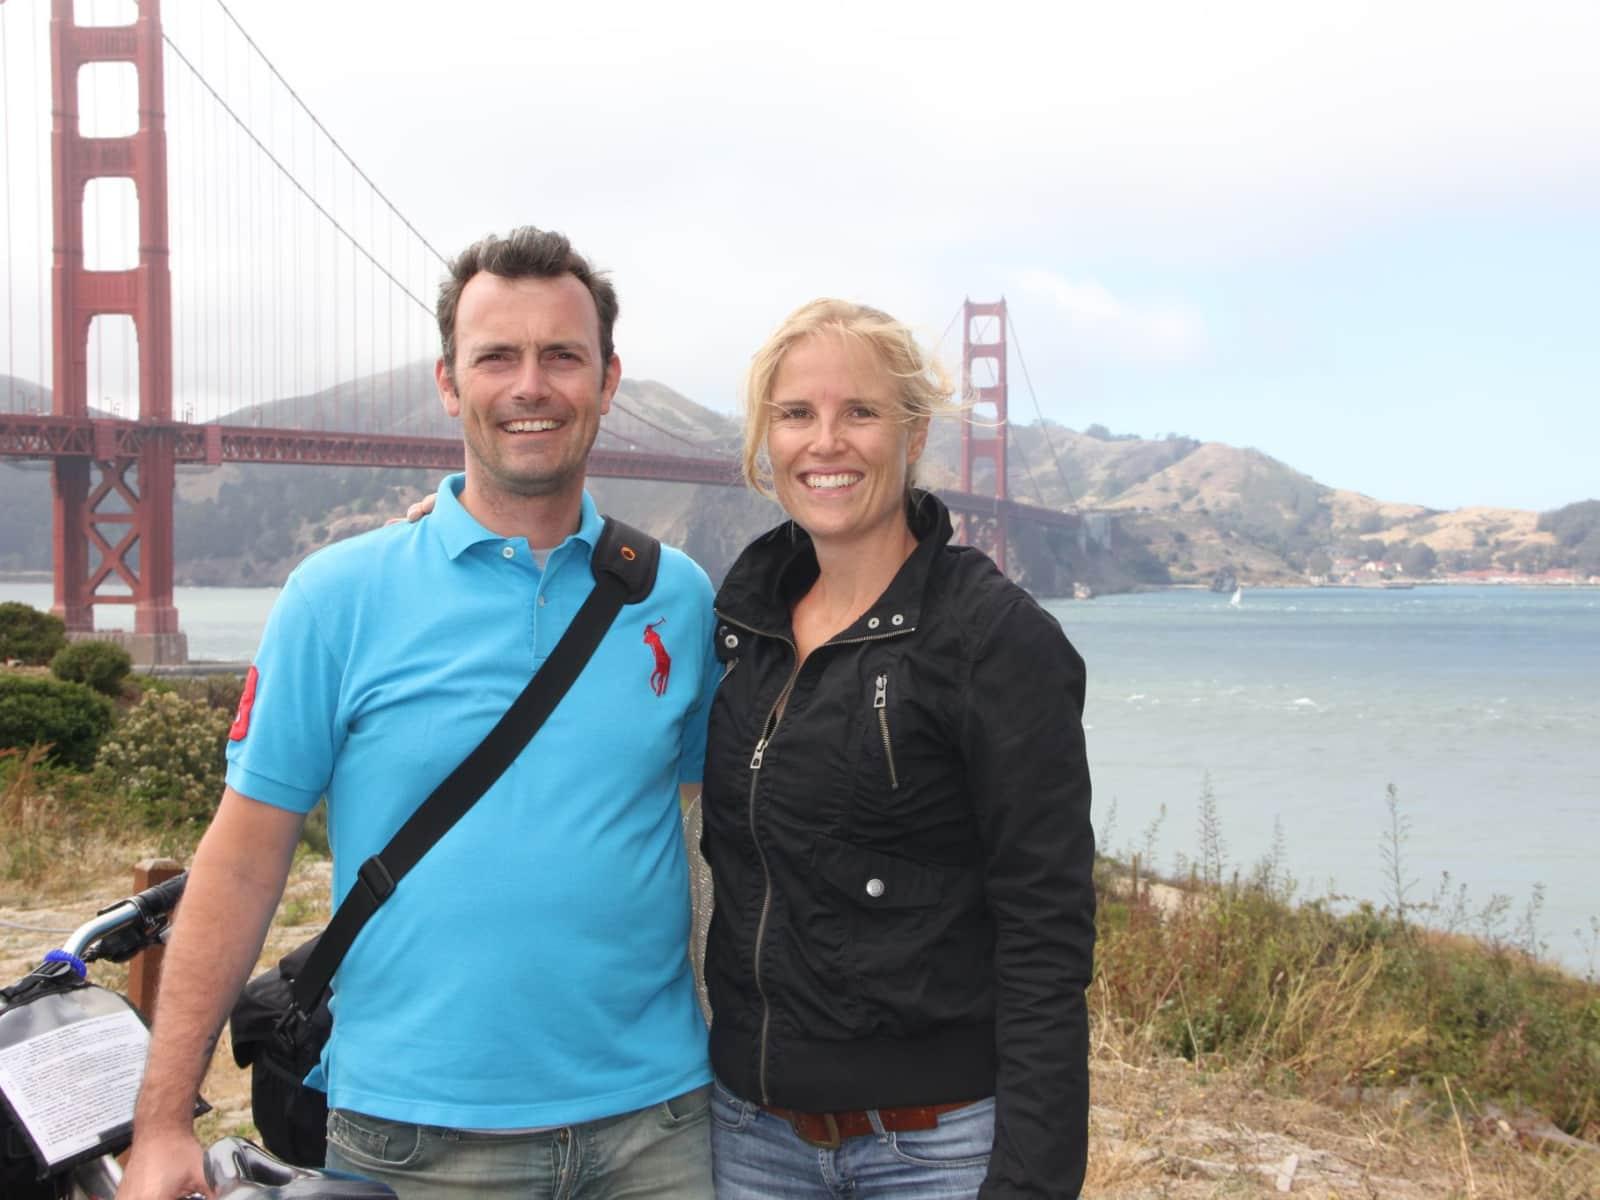 John-frederick & Micheline from Dubai International Financial Centre, United Arab Emirates